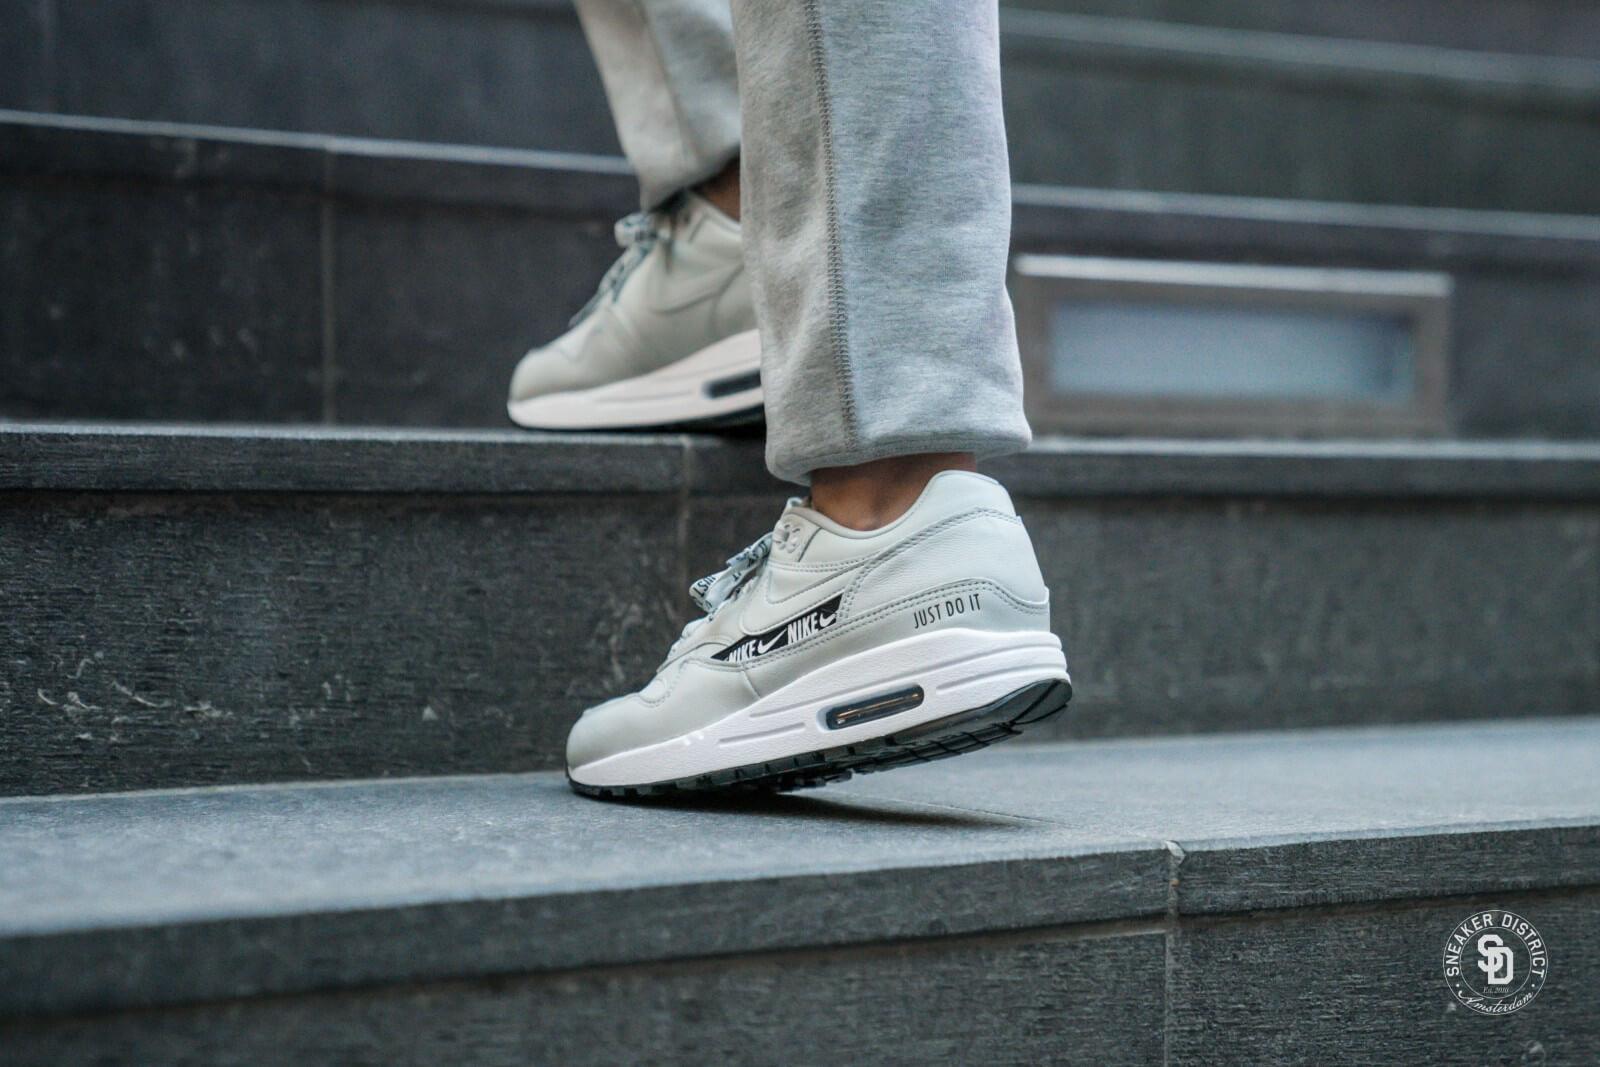 Nike Women's Air Max 1 SE Light SilverBlack White 881101 004